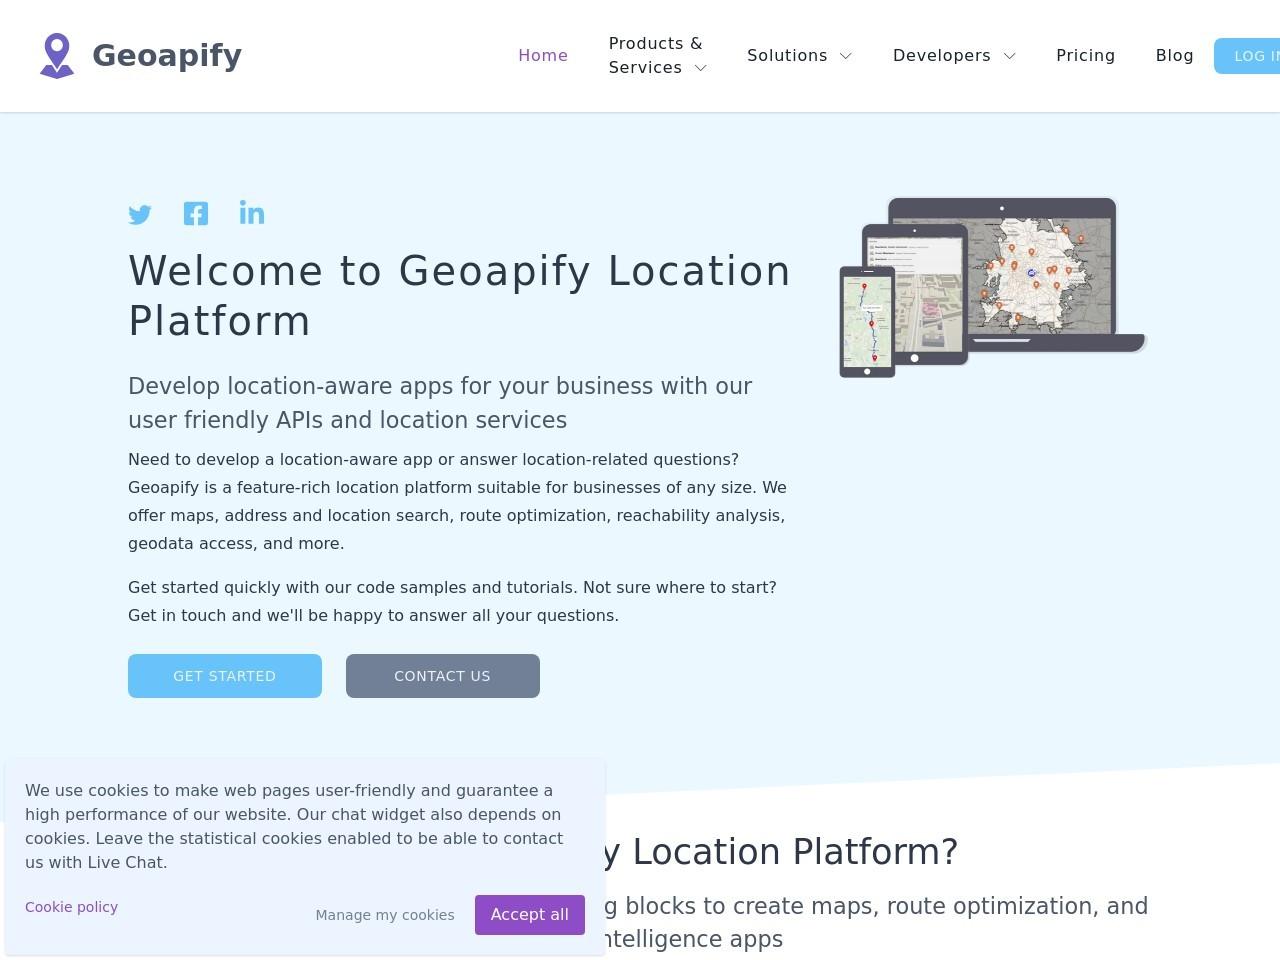 geoapify.com